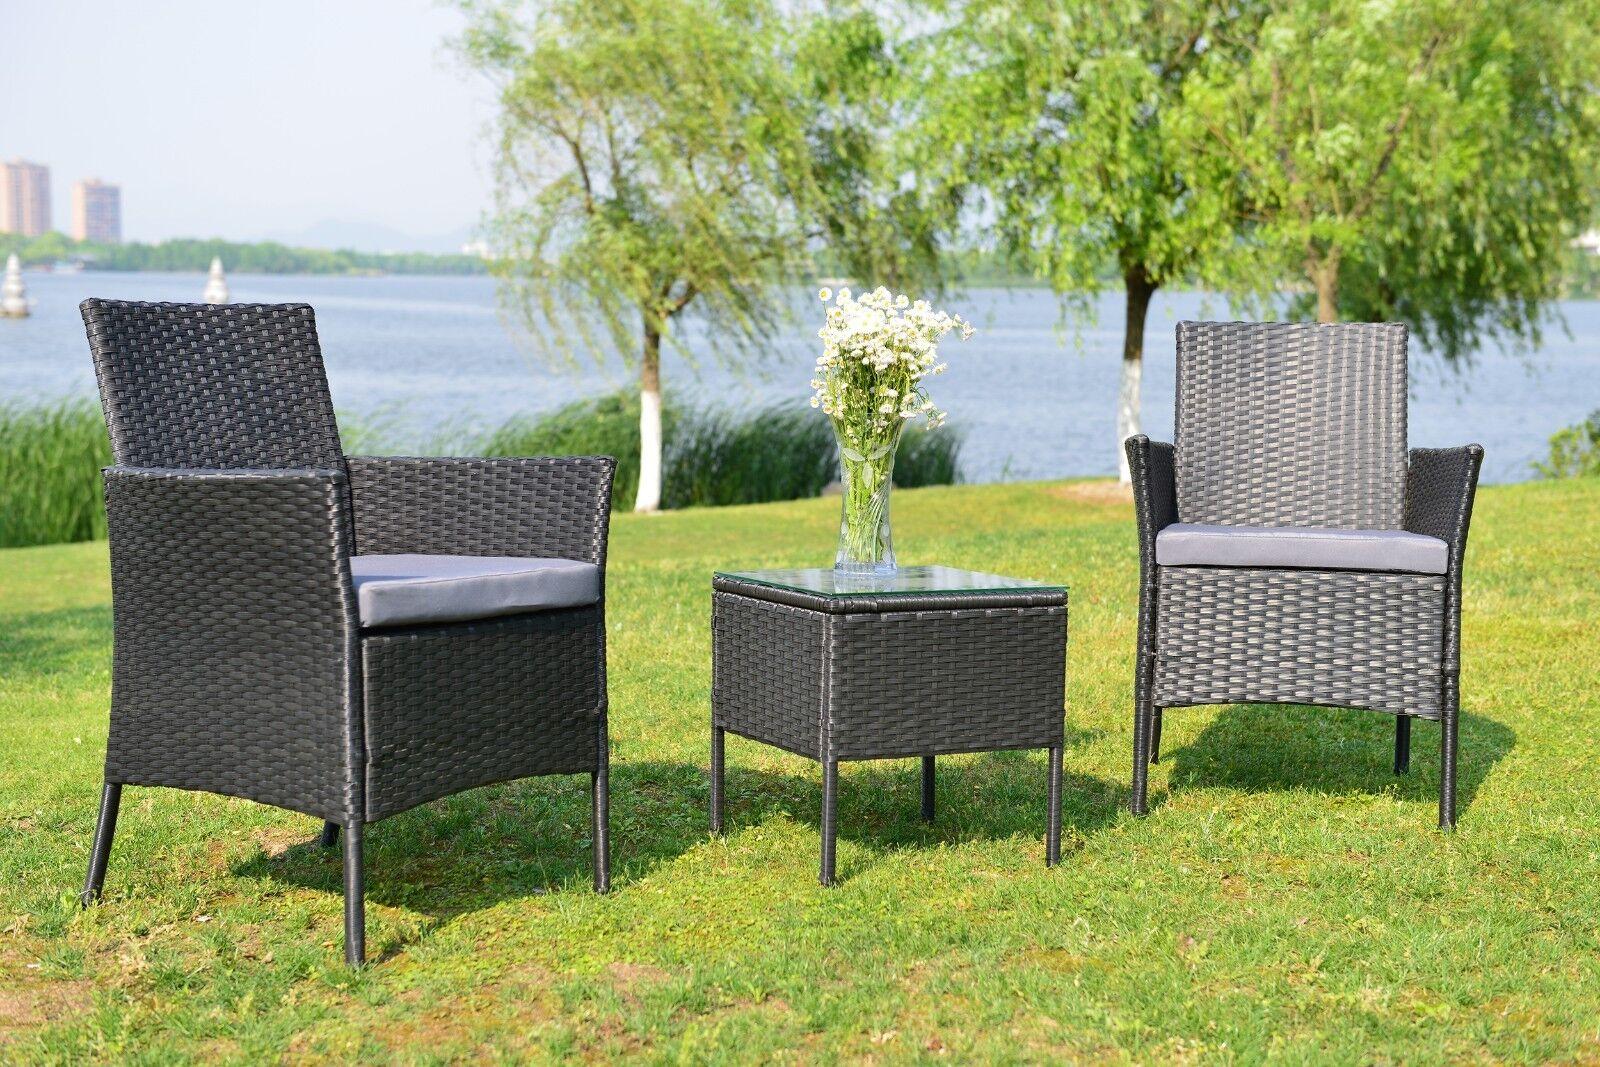 Garden Furniture - 3 Pcs Rattan Sofa Patio Furniture Garden Wicker Chair Bistro Set Cushioned Seat